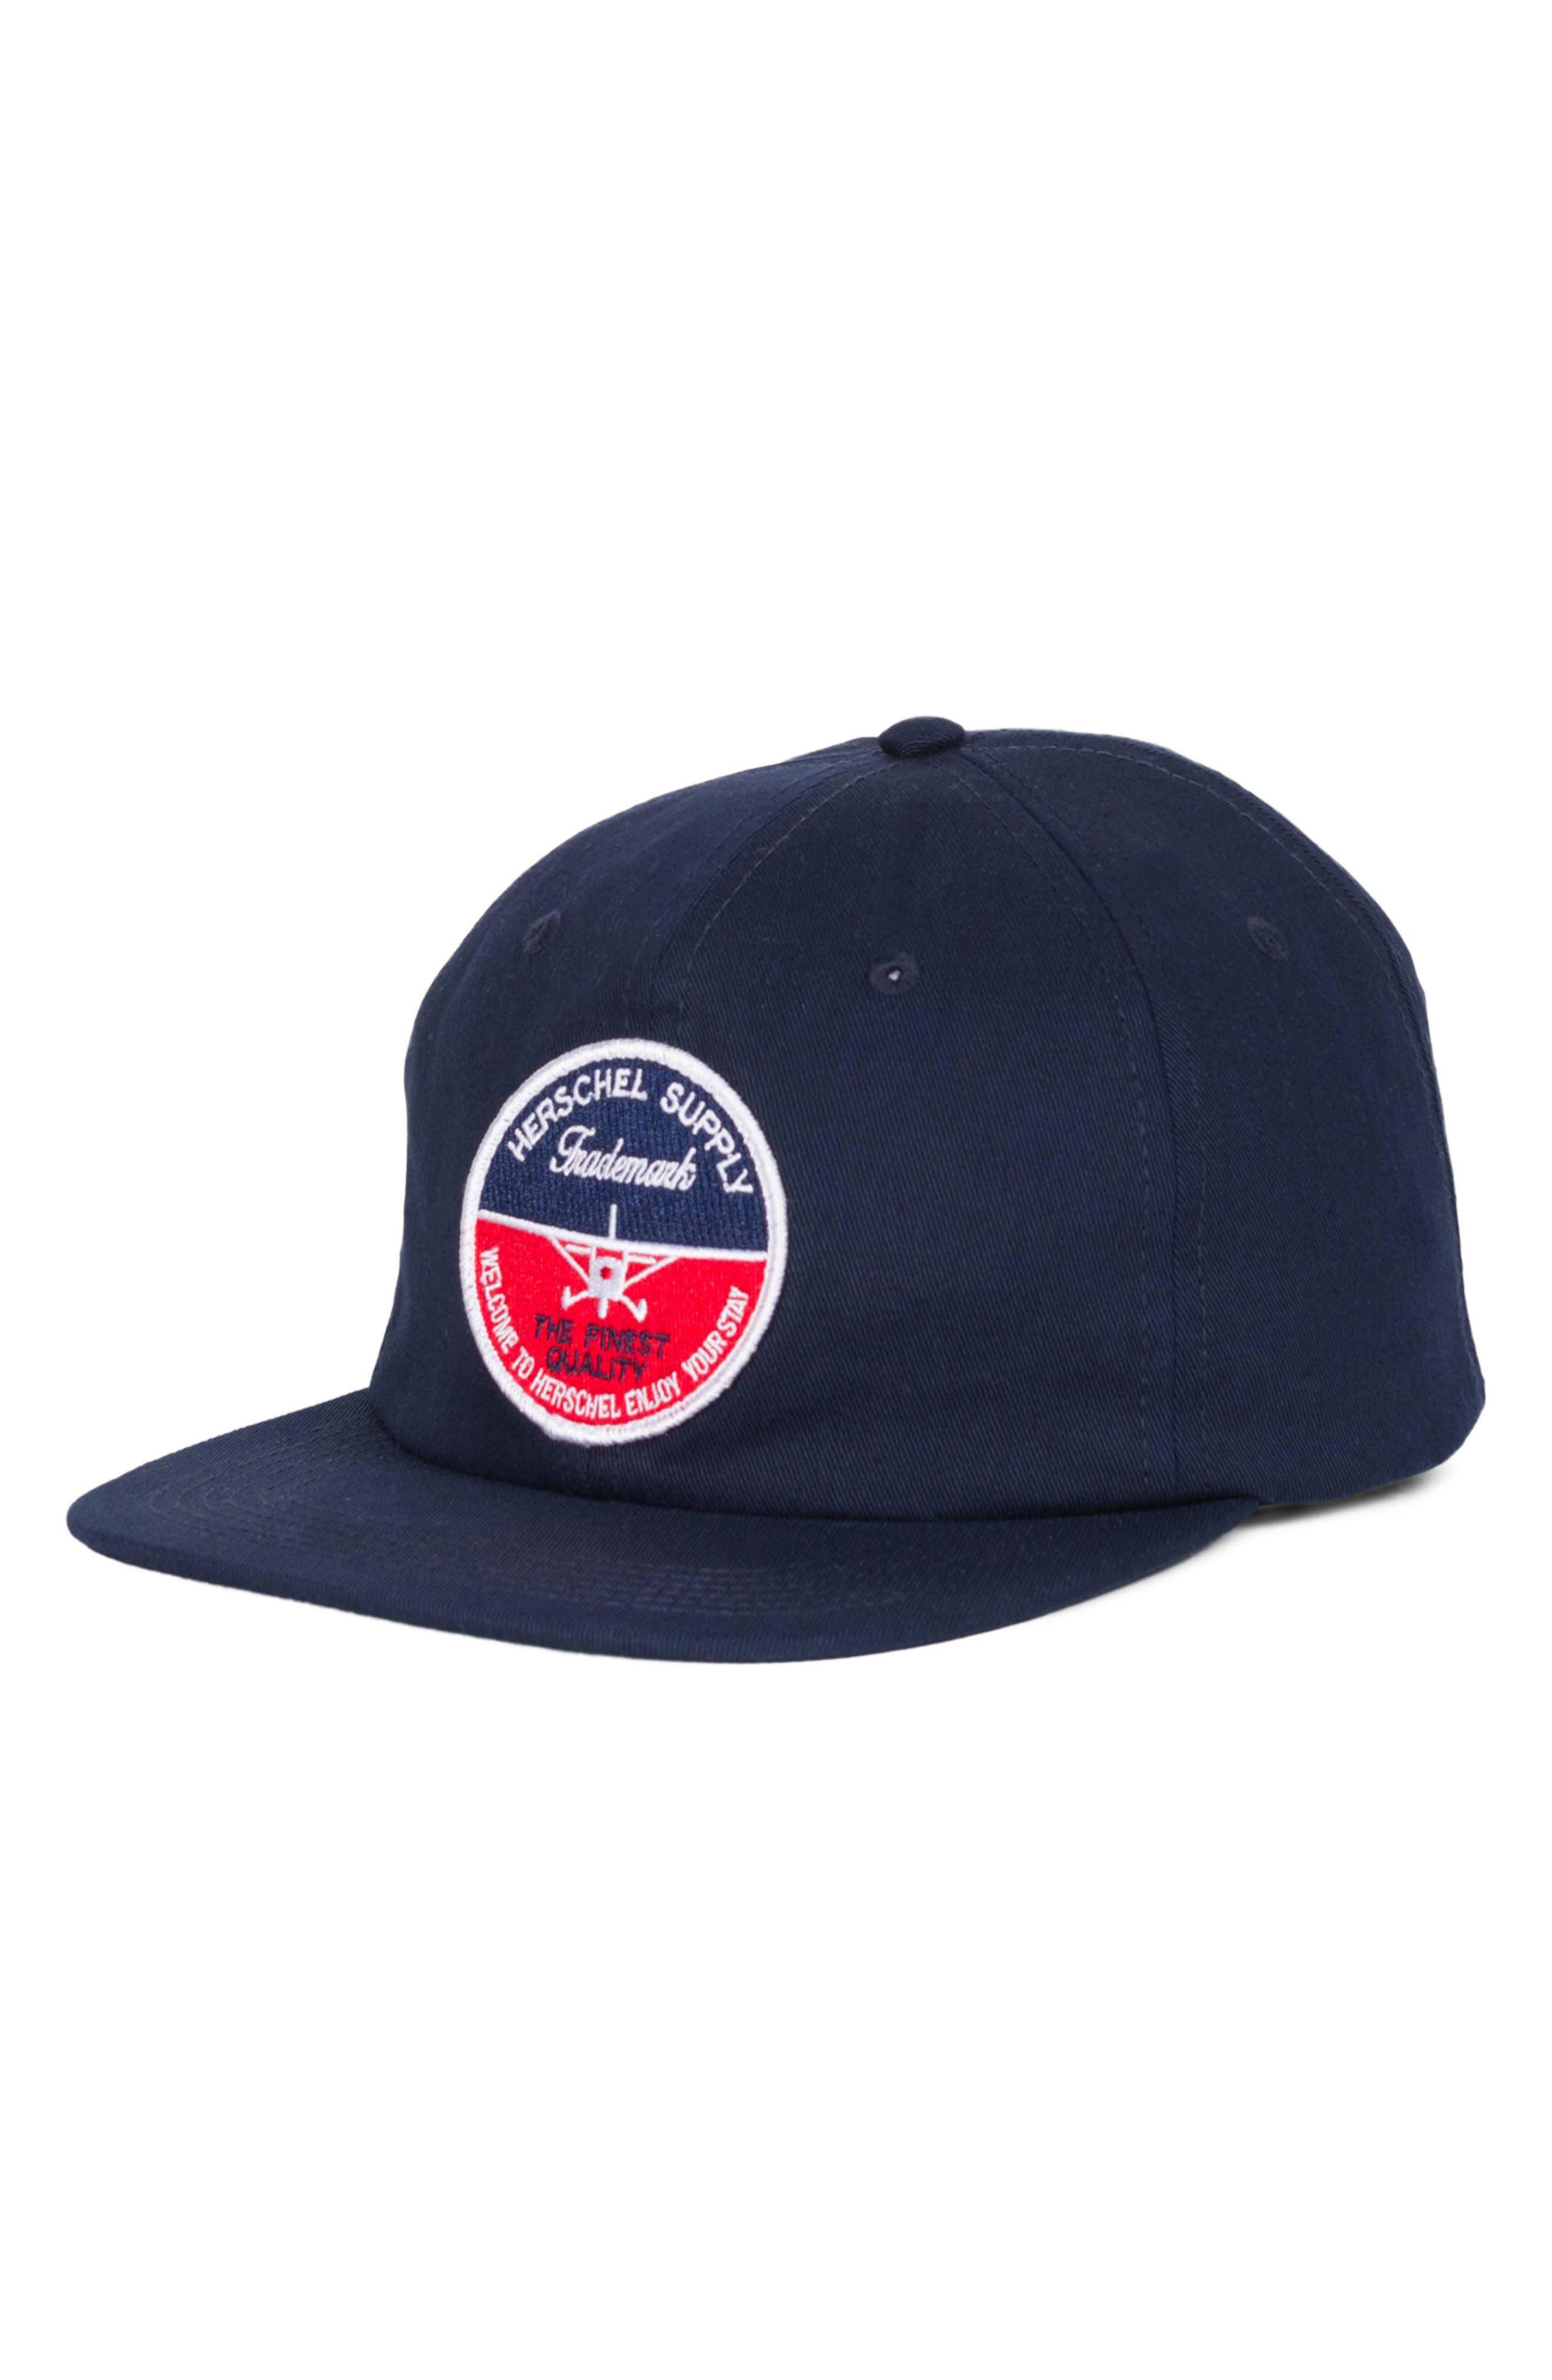 172 Baseball Cap,                         Main,                         color, NAVY